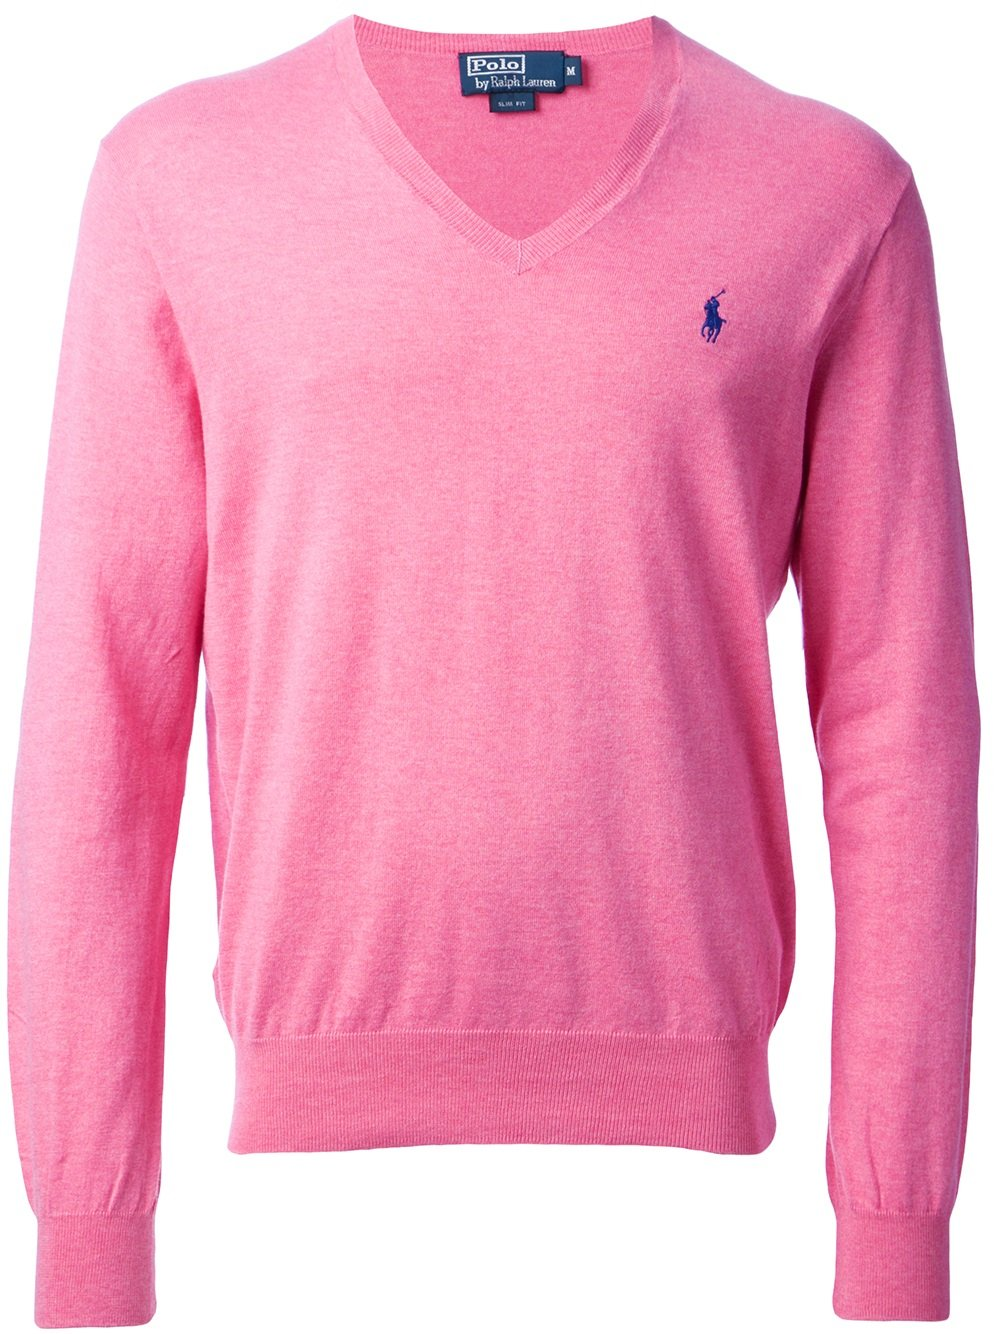 7e7f8cccc ... greece polo ralph lauren classic sweater in purple for men lyst 29751  b1065